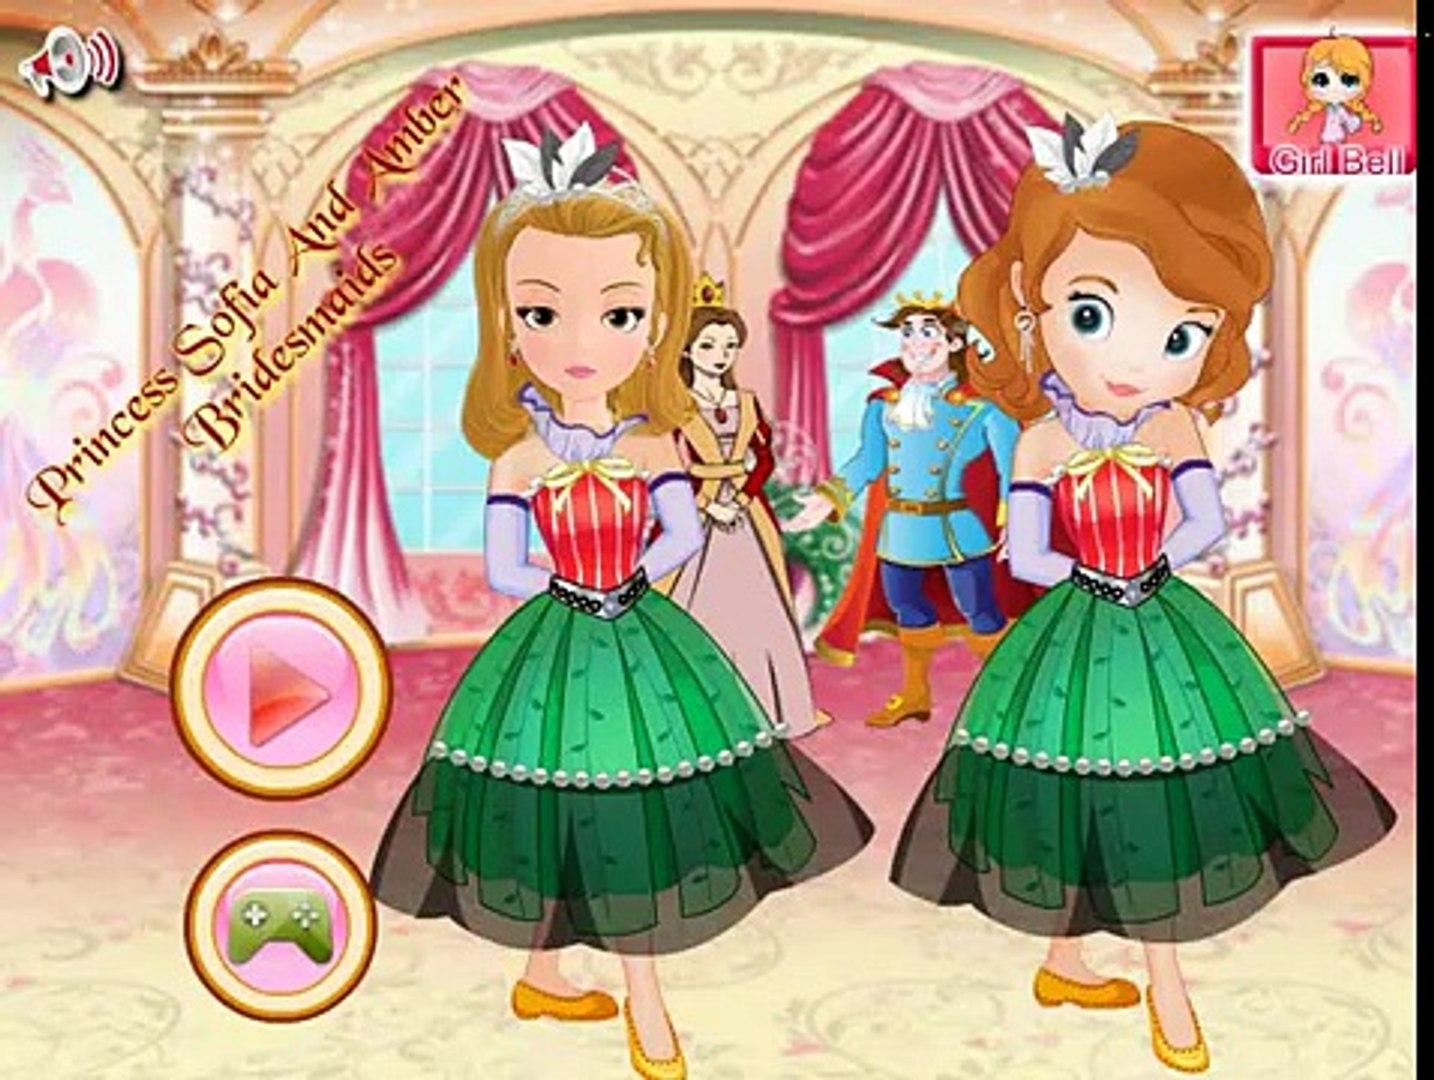 София Прекрасная и Эмбер подружки невесты/Princess Sofia and Amber Bridesmaids